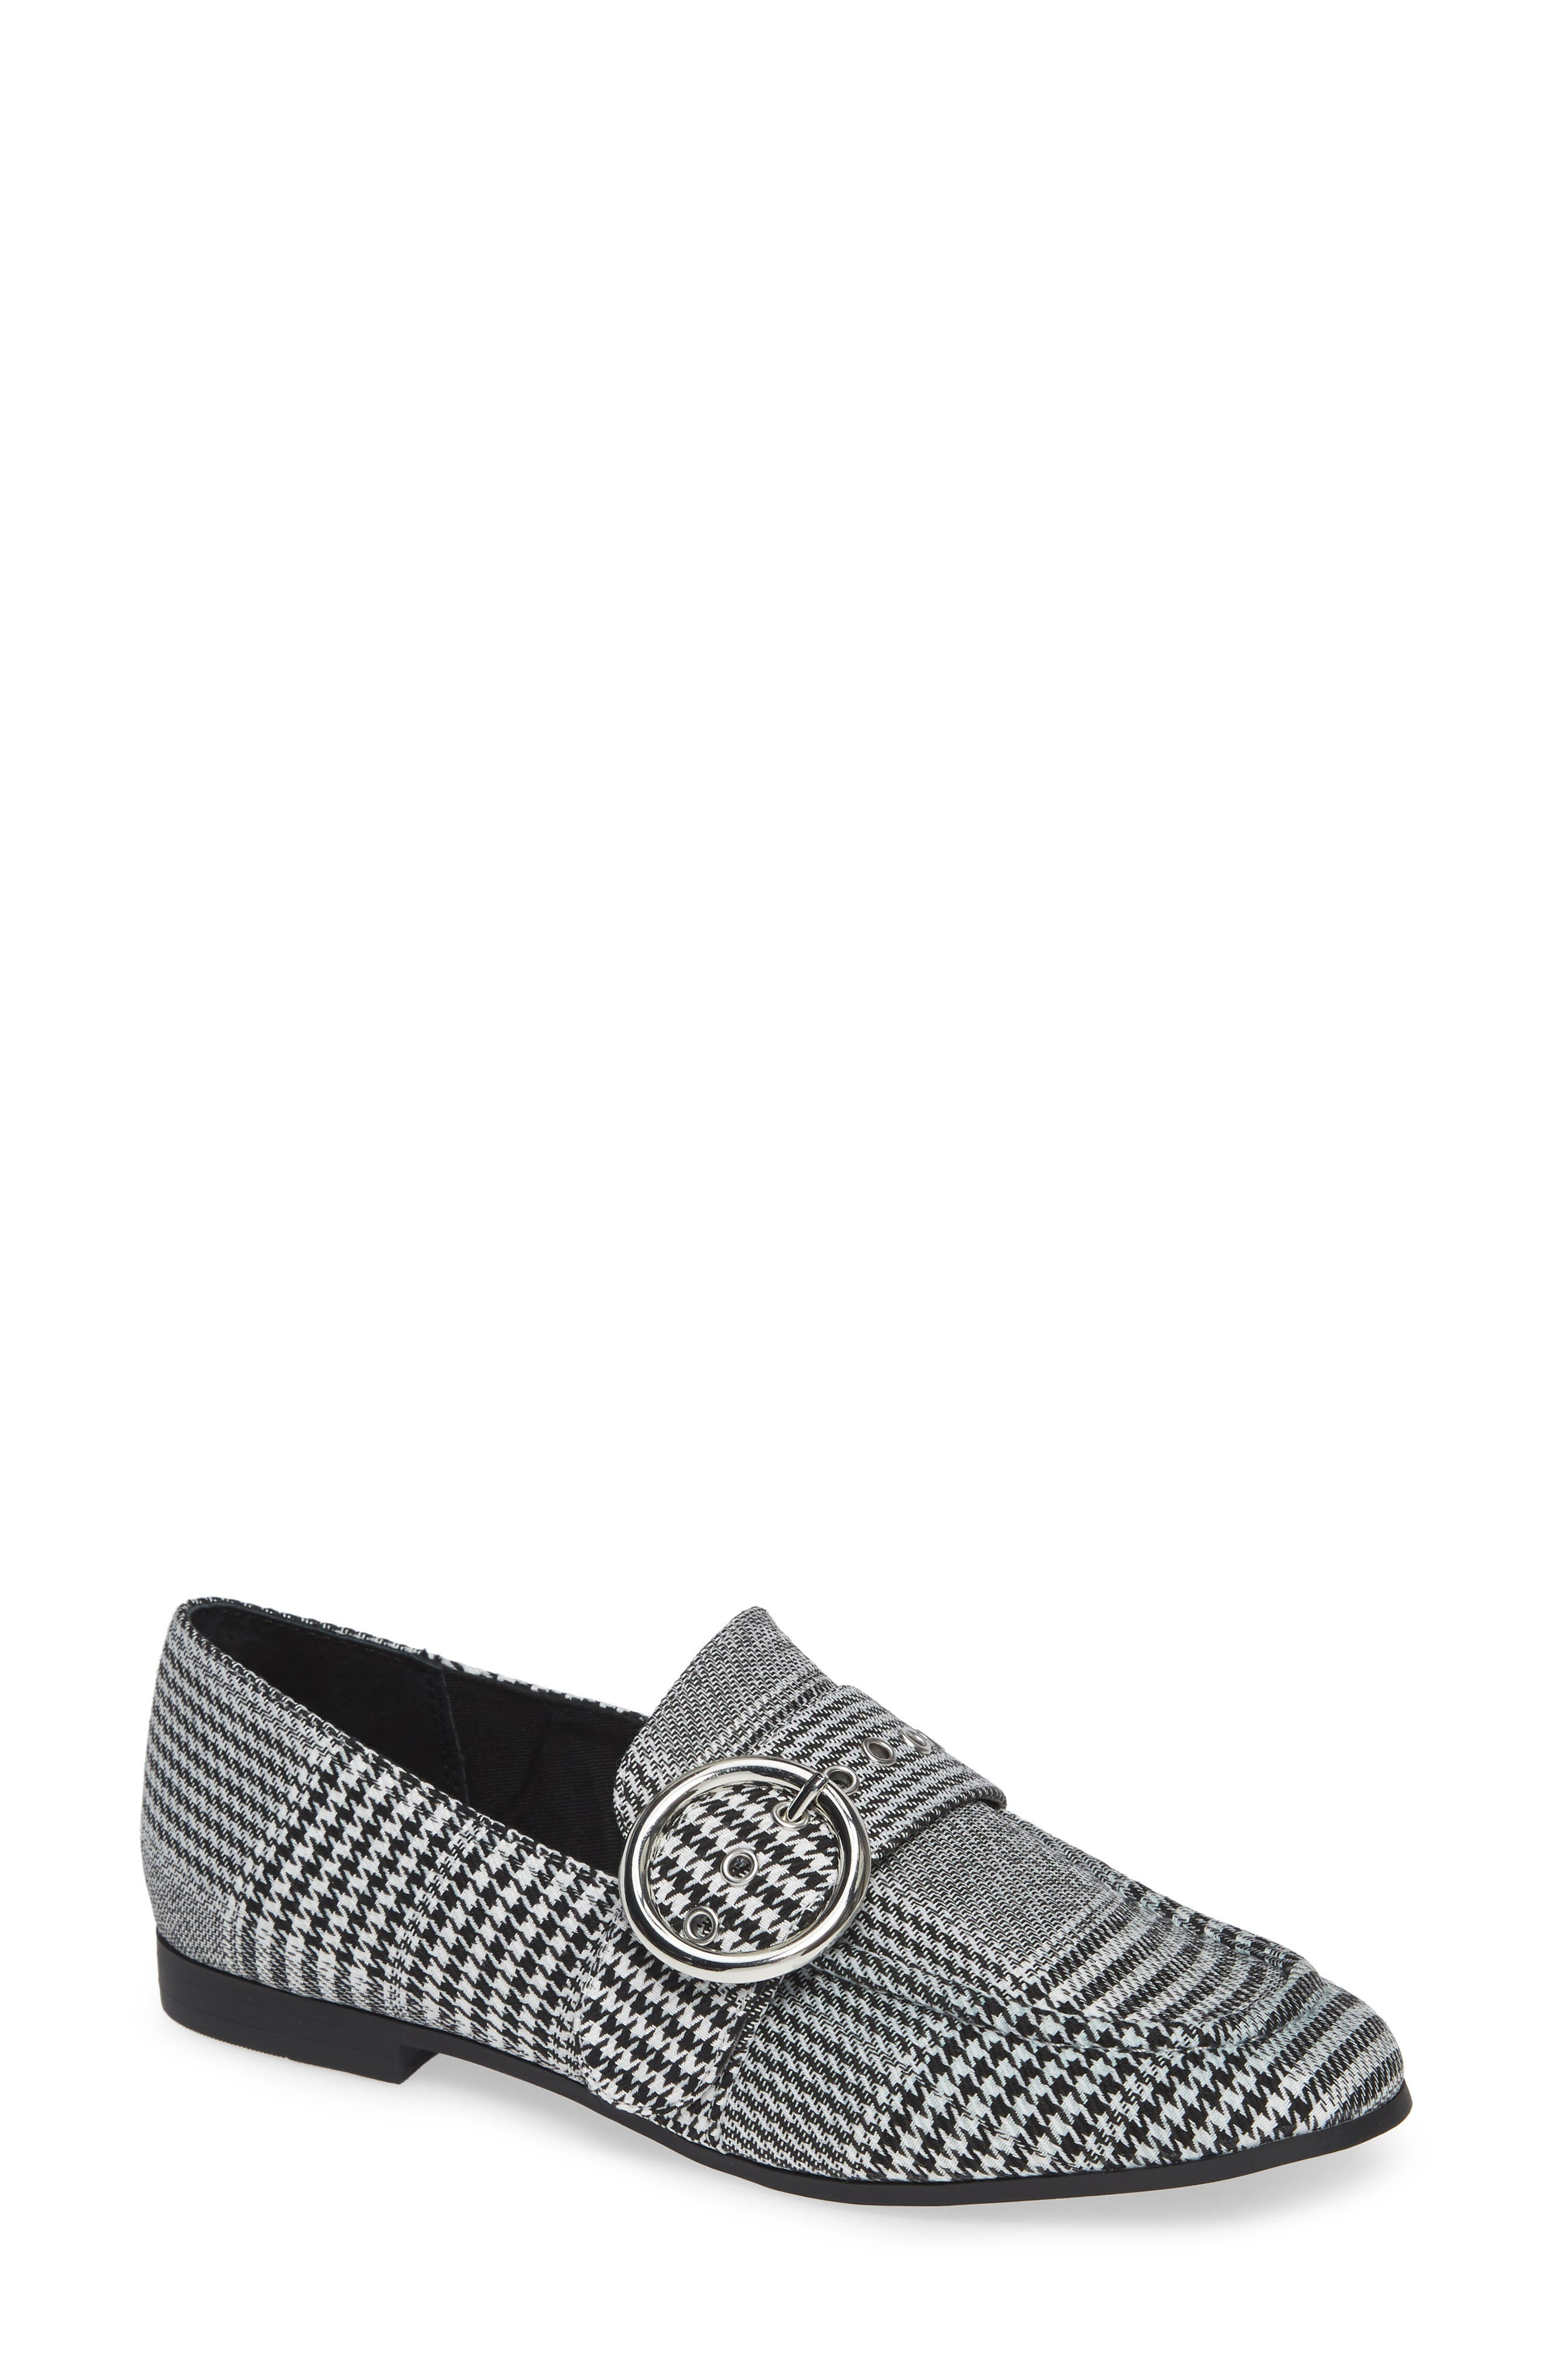 Balance Loafer,                         Main,                         color, 015